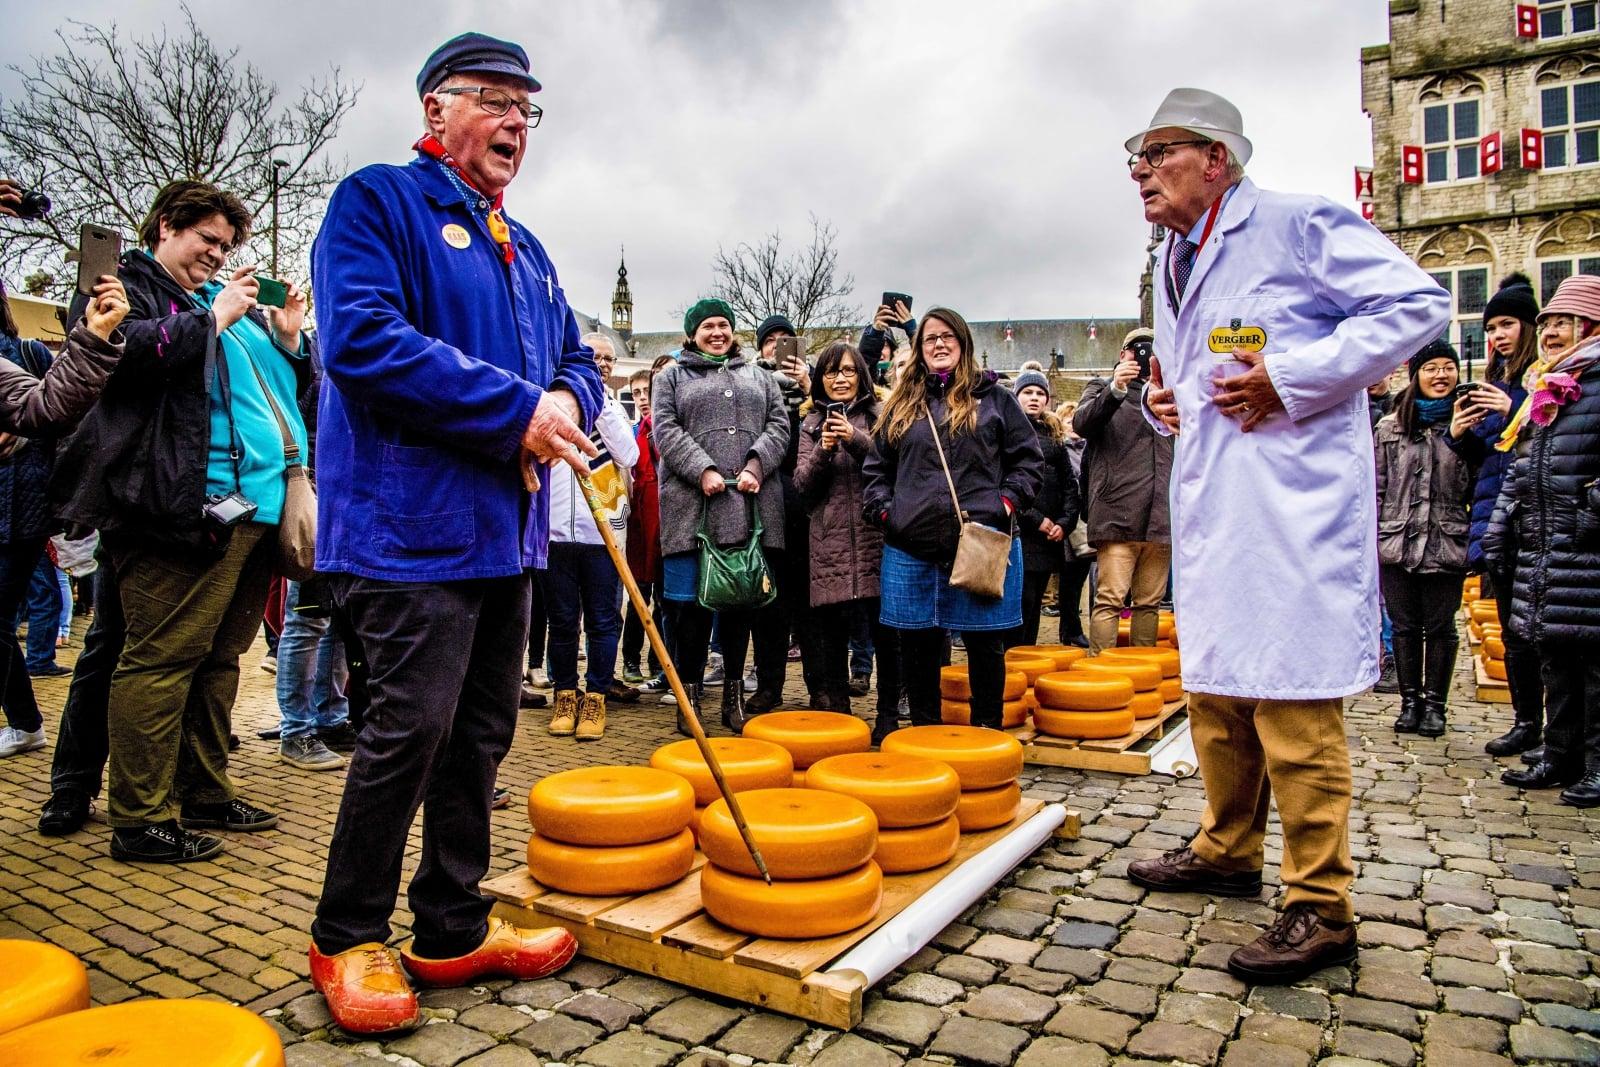 Tar serowy w Holandii EPA/ROBIN UTRECHT